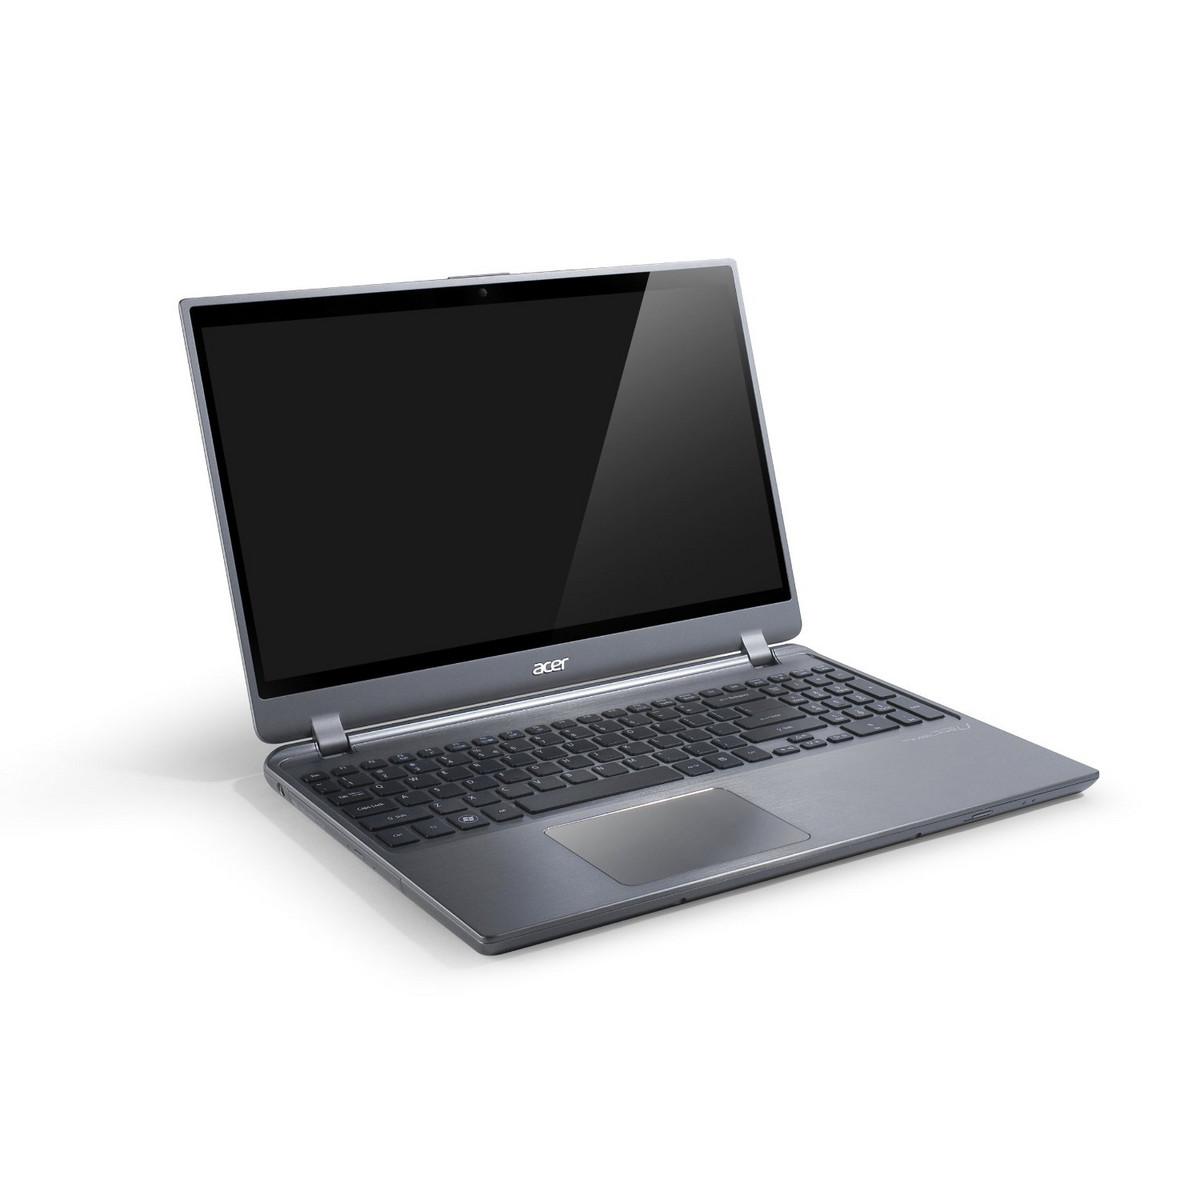 Acer Aspire M5-481G Intel RST 64 BIT Driver